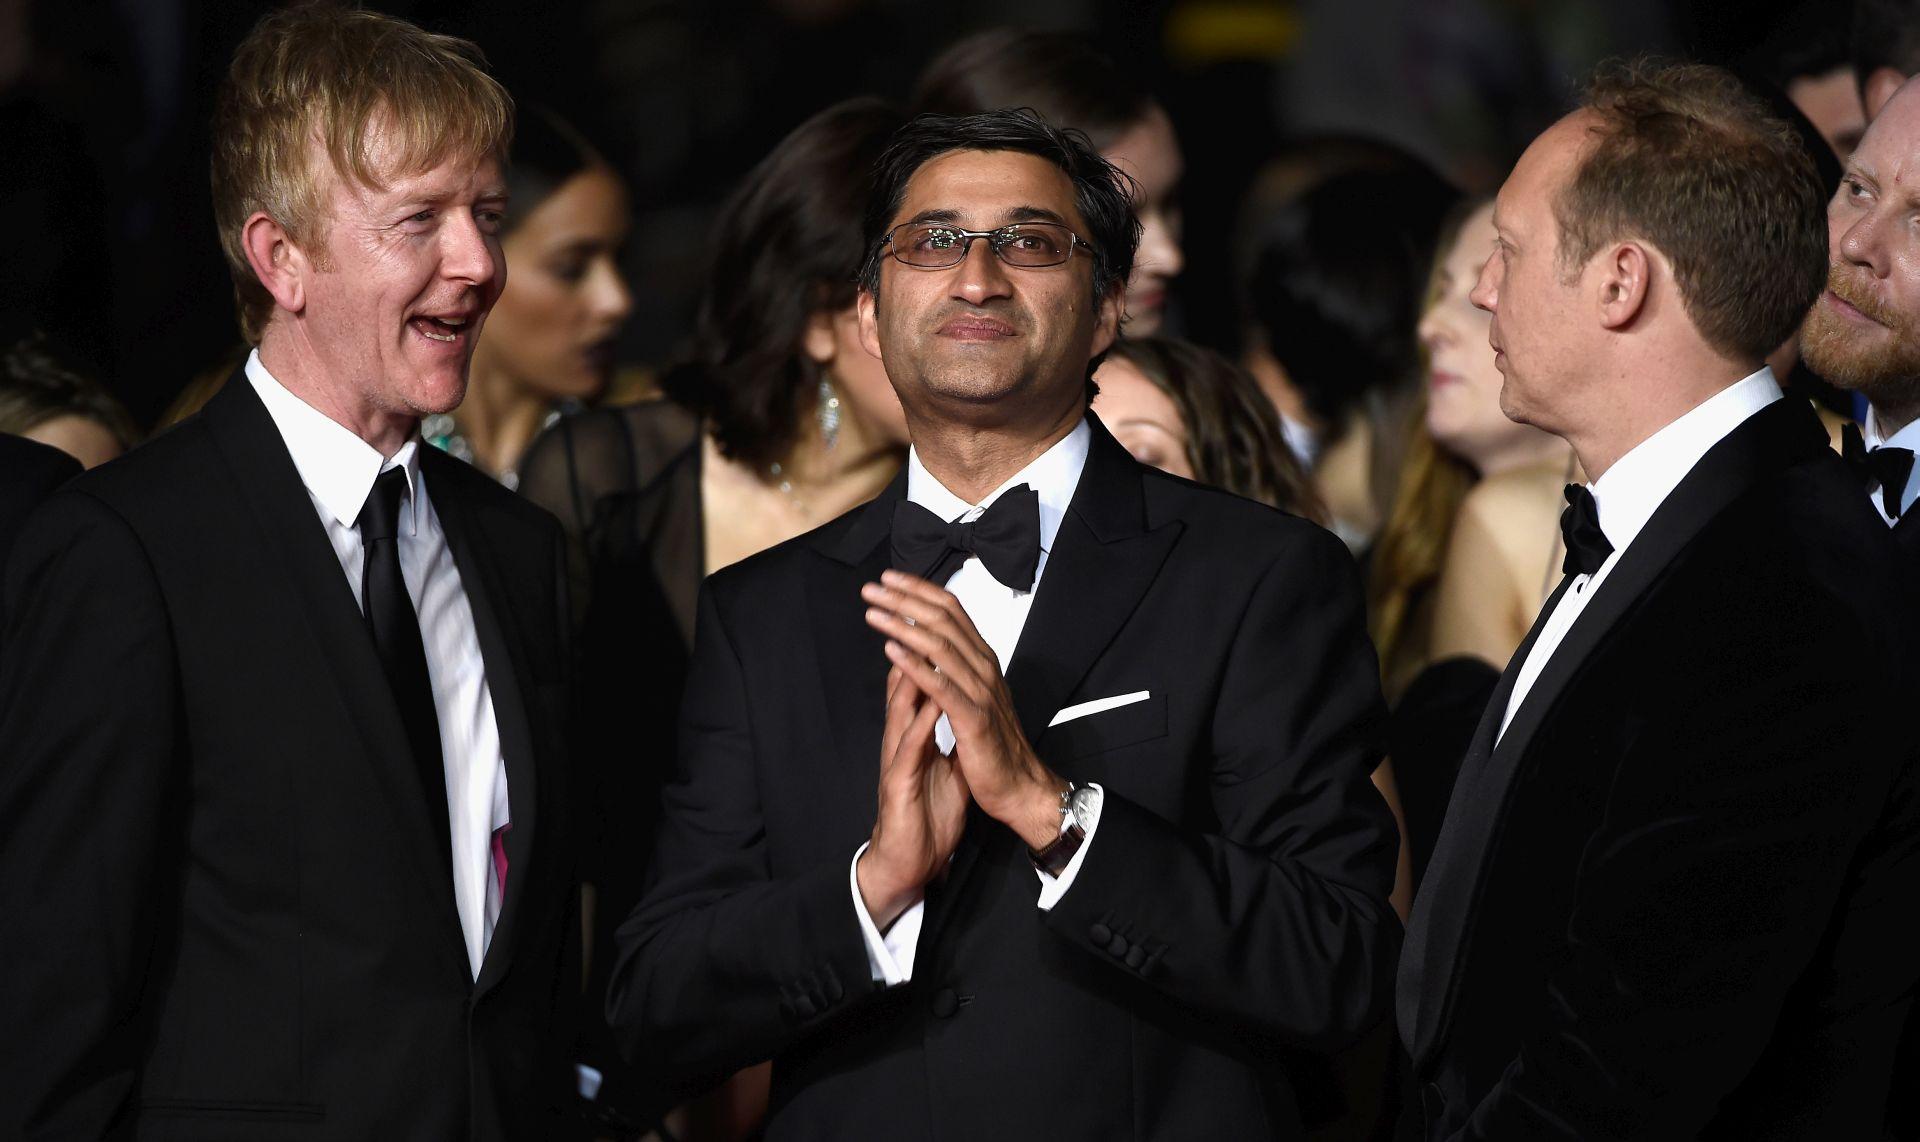 Chris King i Asif Kapadia. FOTO: Ian Gavan/Getty Images